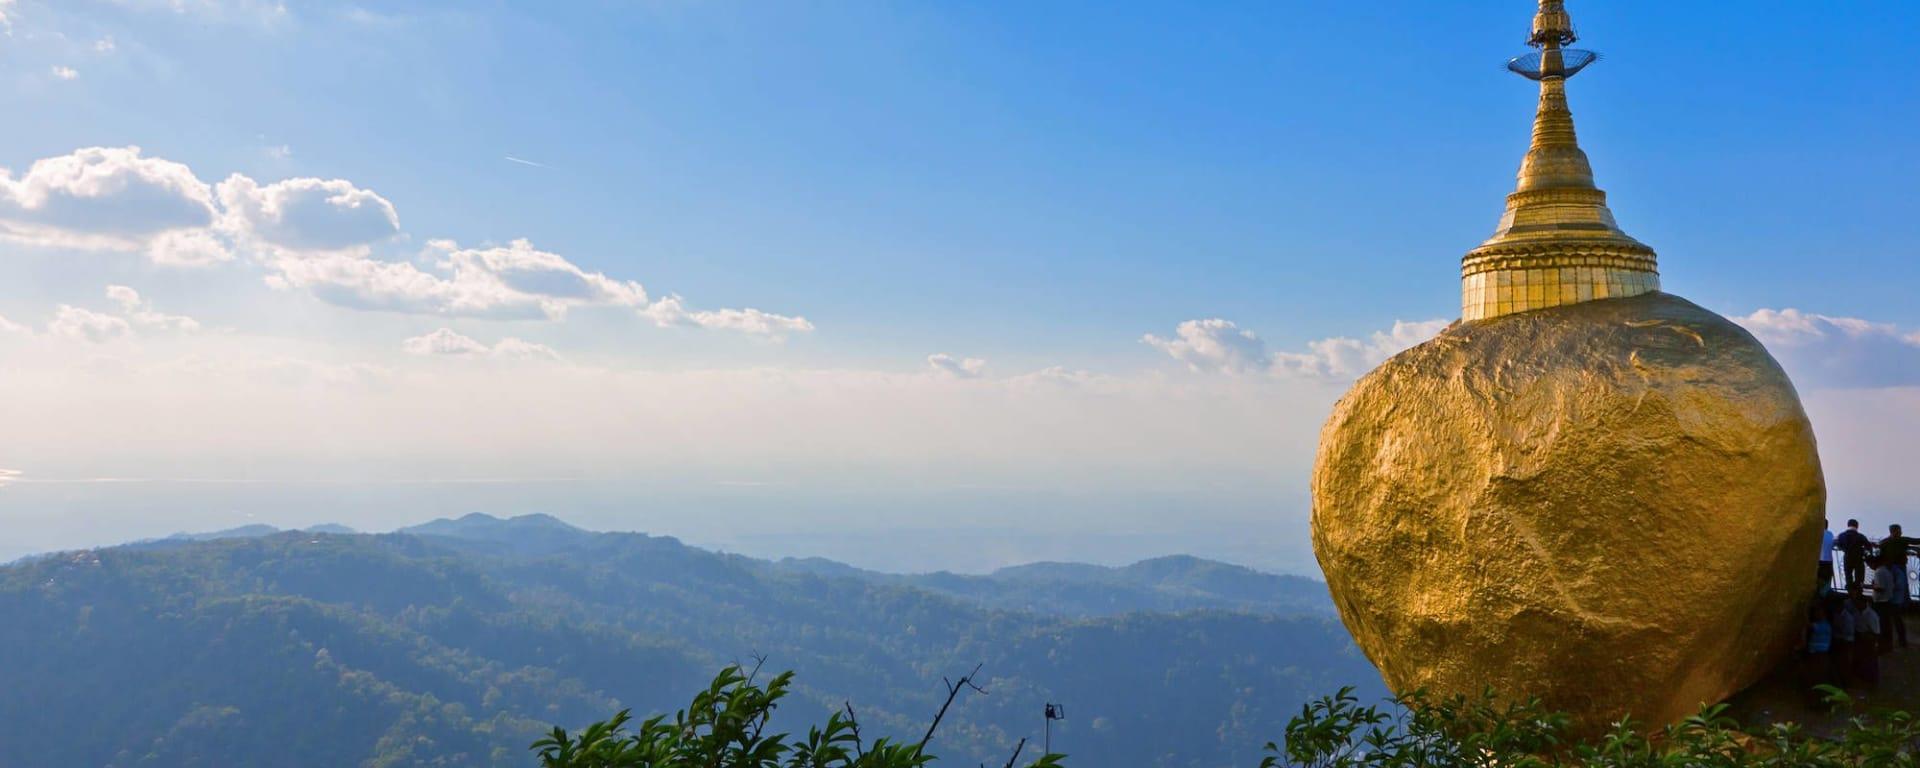 Der magische goldene Felsen ab Yangon: Golden Rock